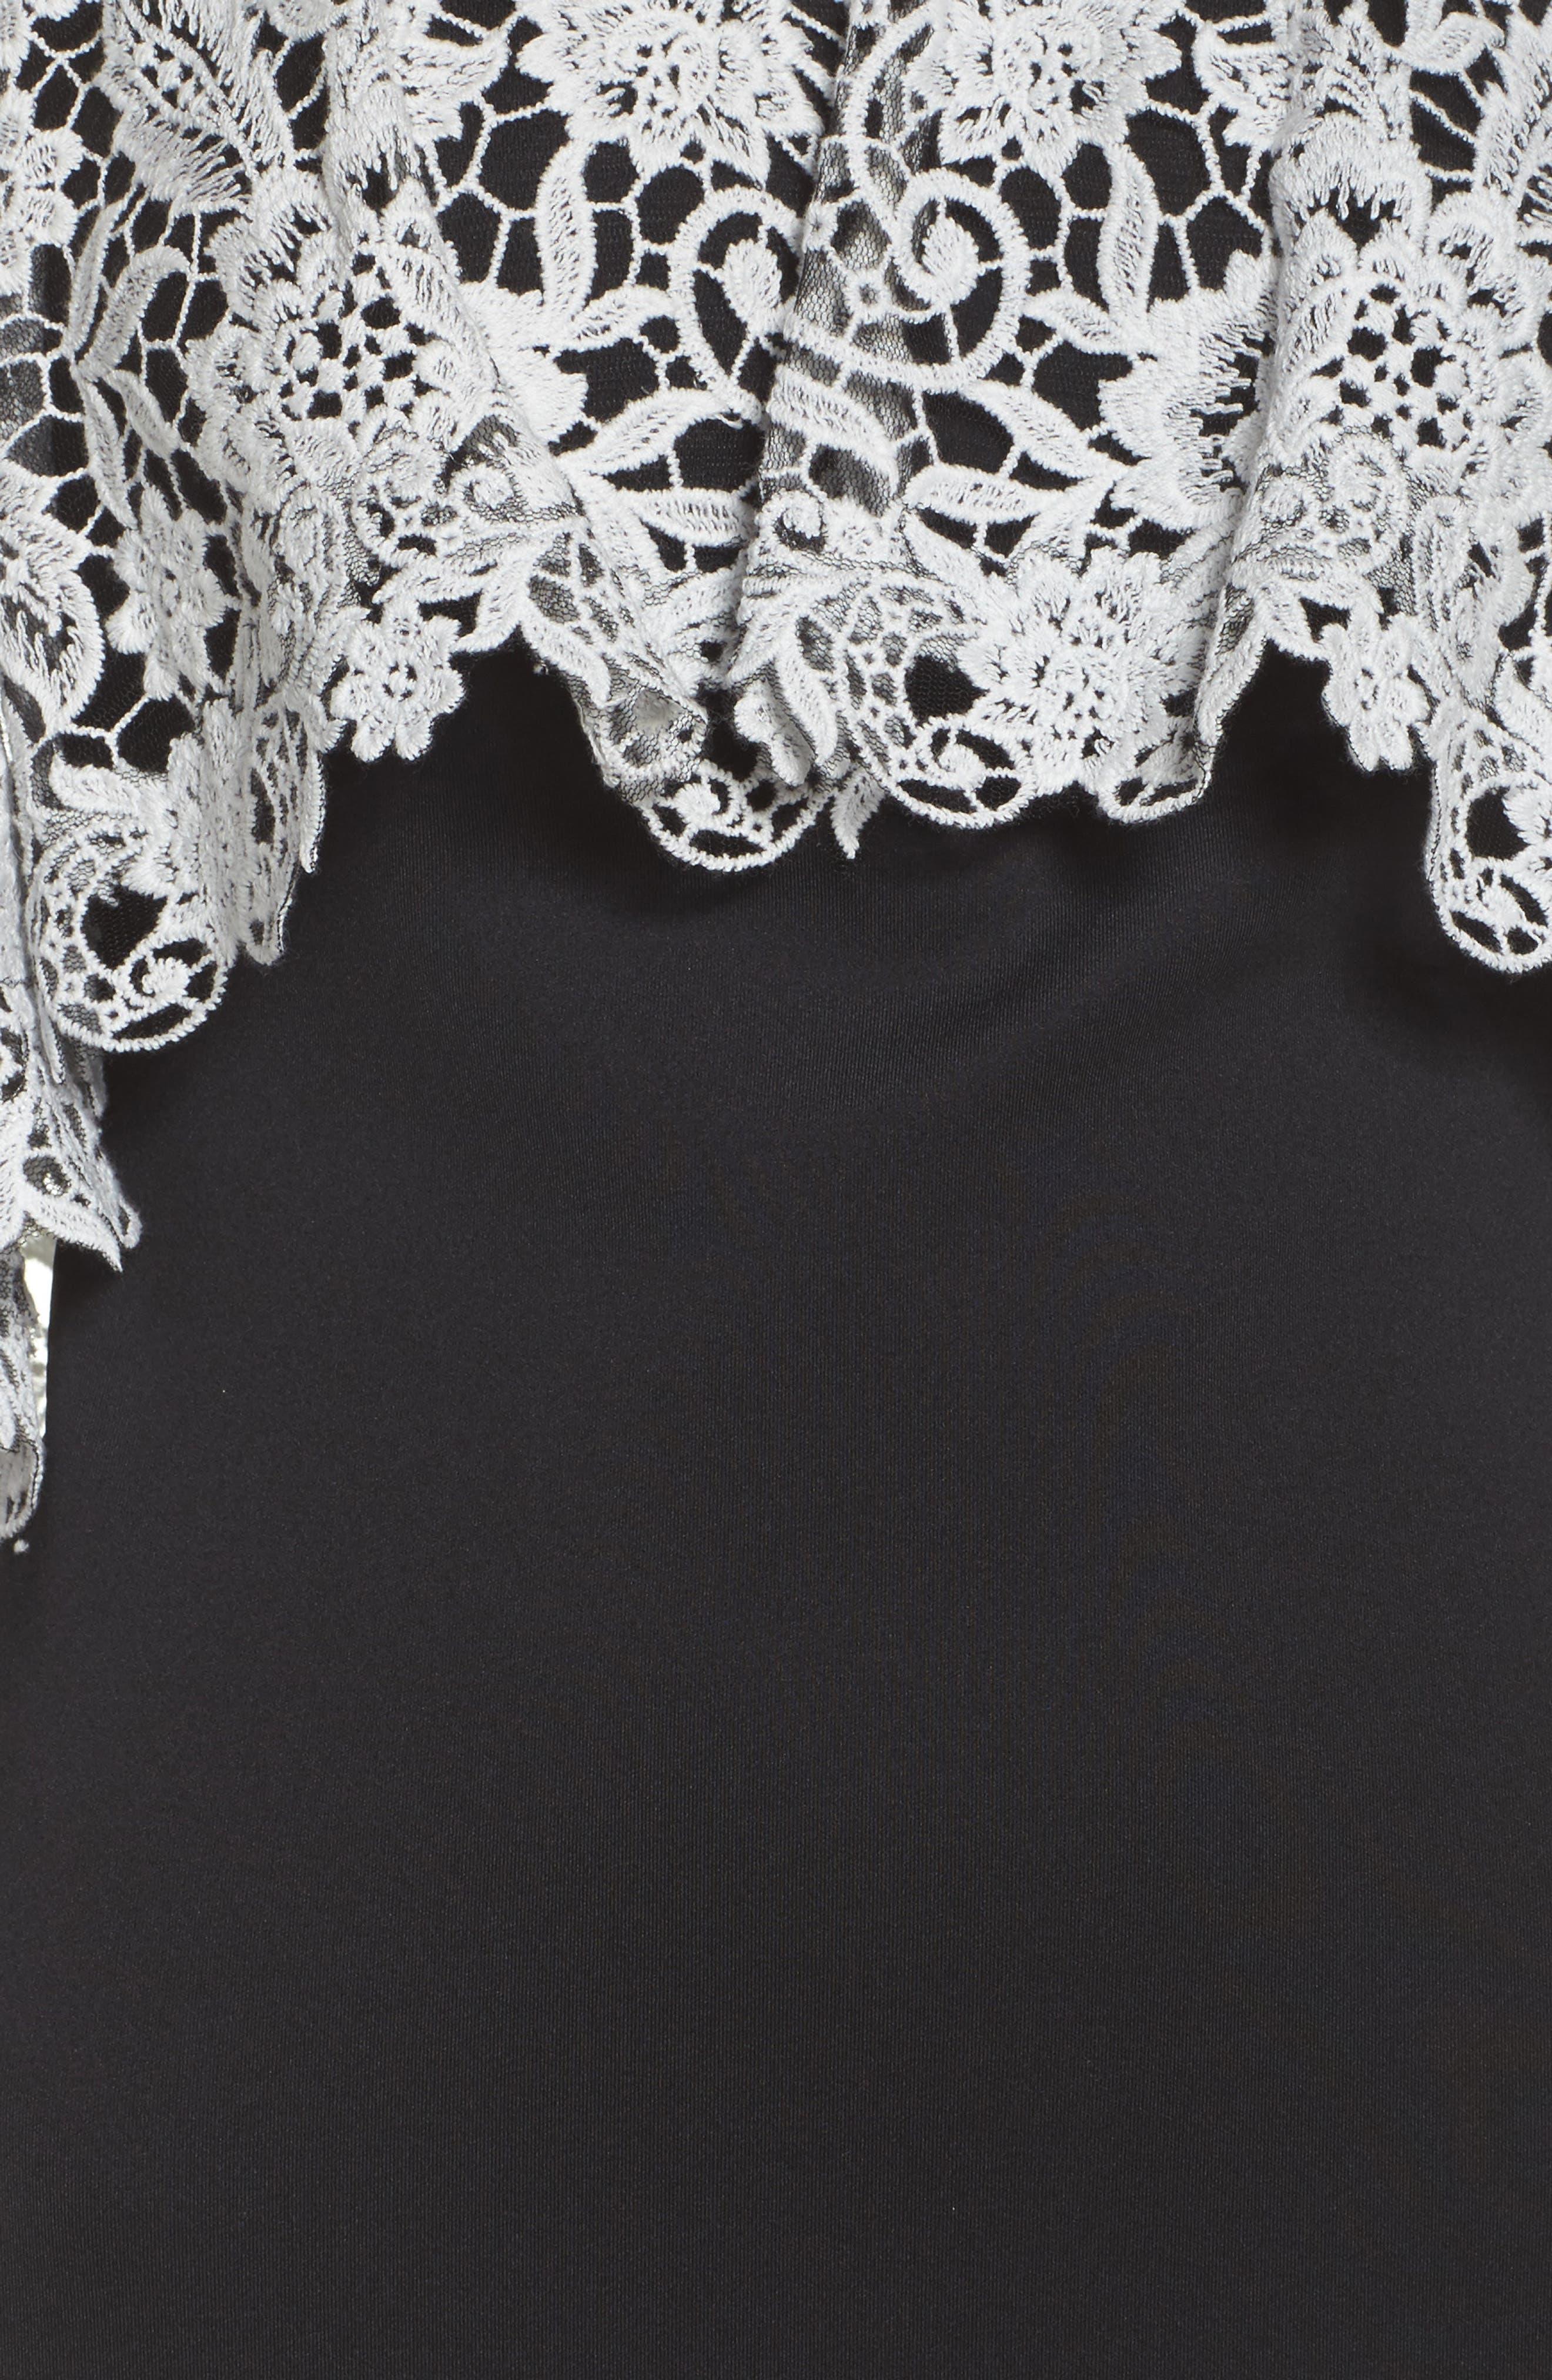 Illusion Neck Cape Dress,                             Alternate thumbnail 5, color,                             Black/ Ivory